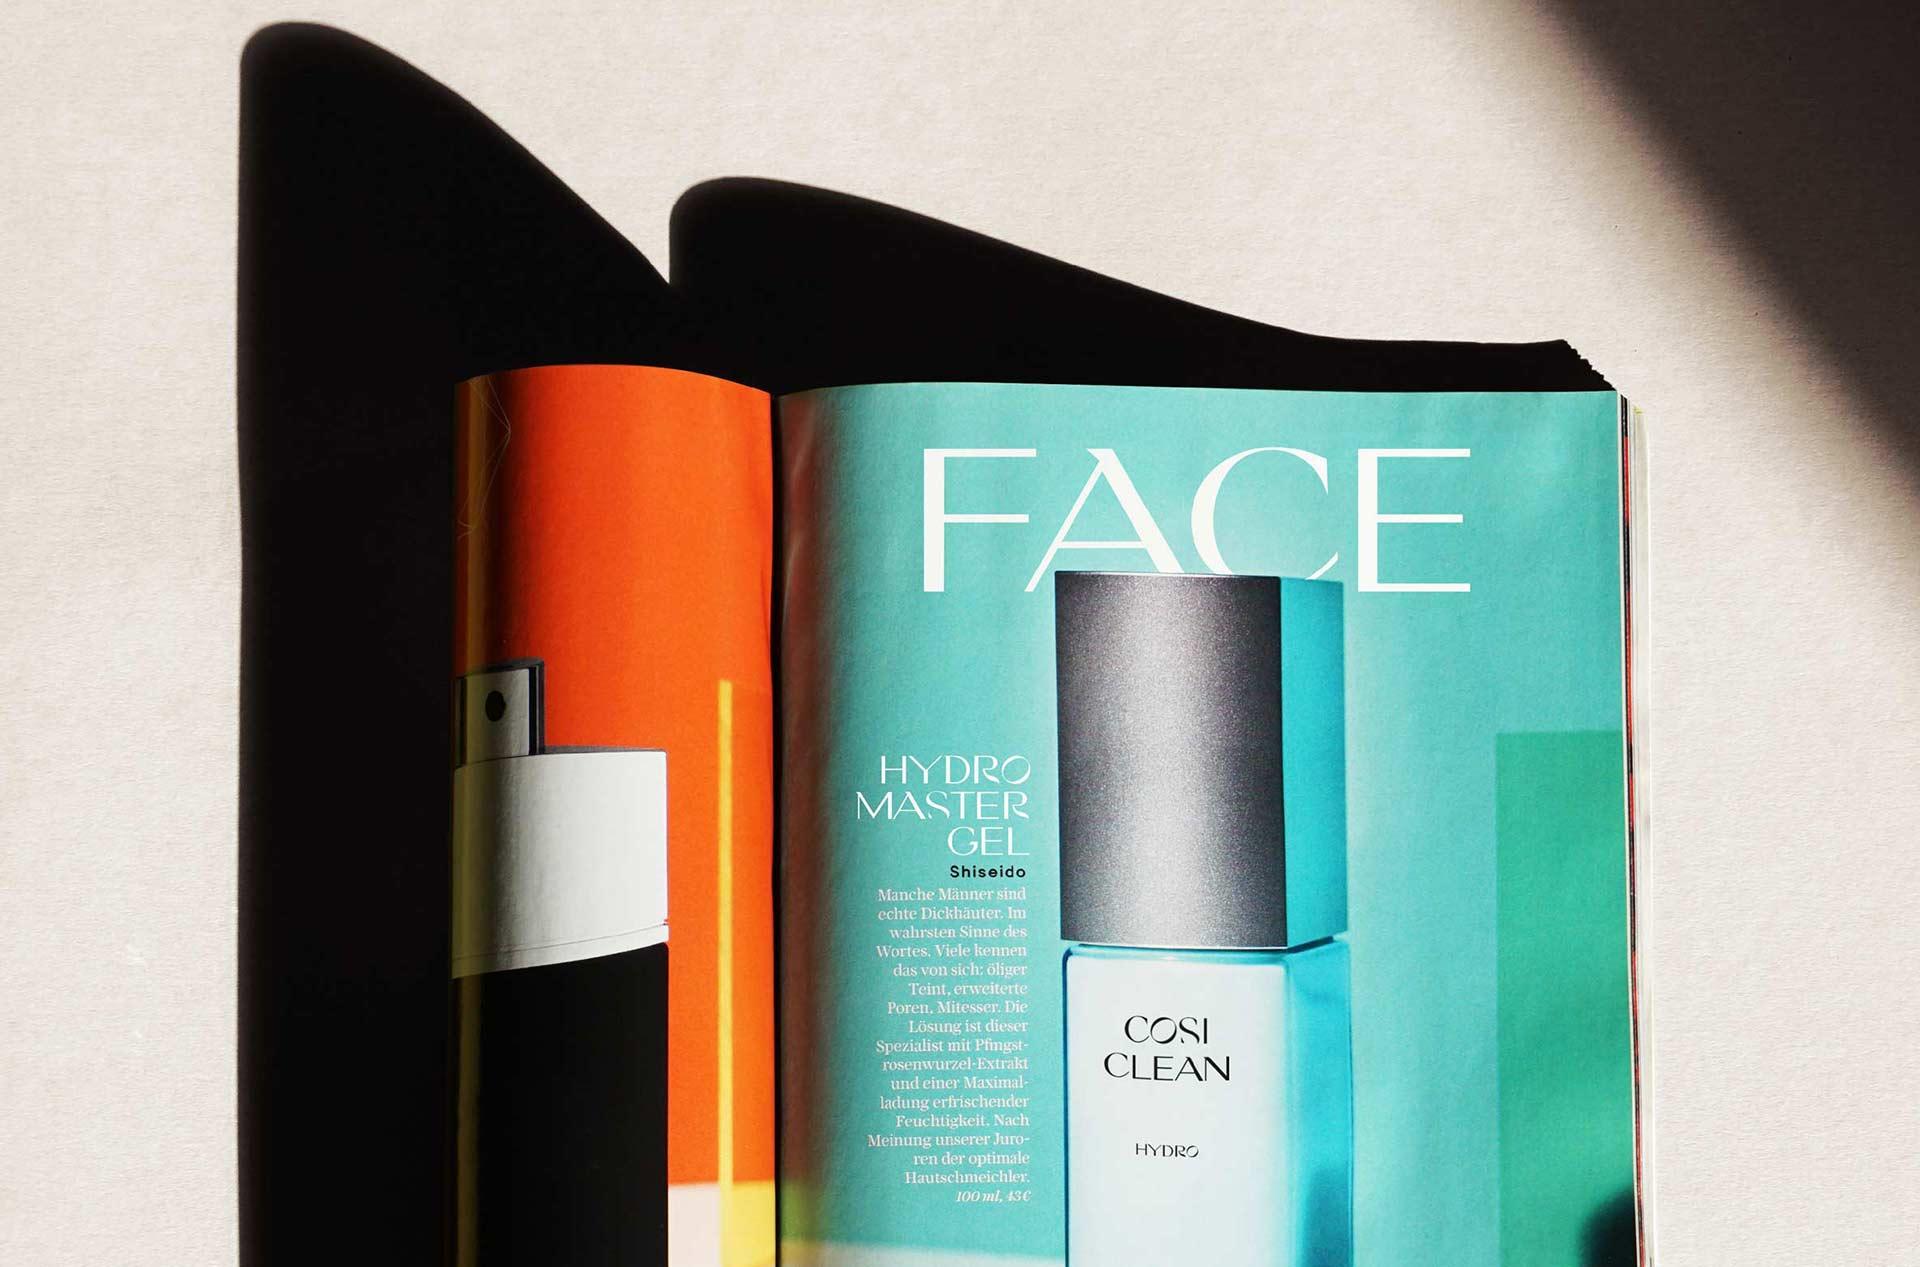 Cosi-Times-Typeface-Font-Nikolas-Wrobel-Face